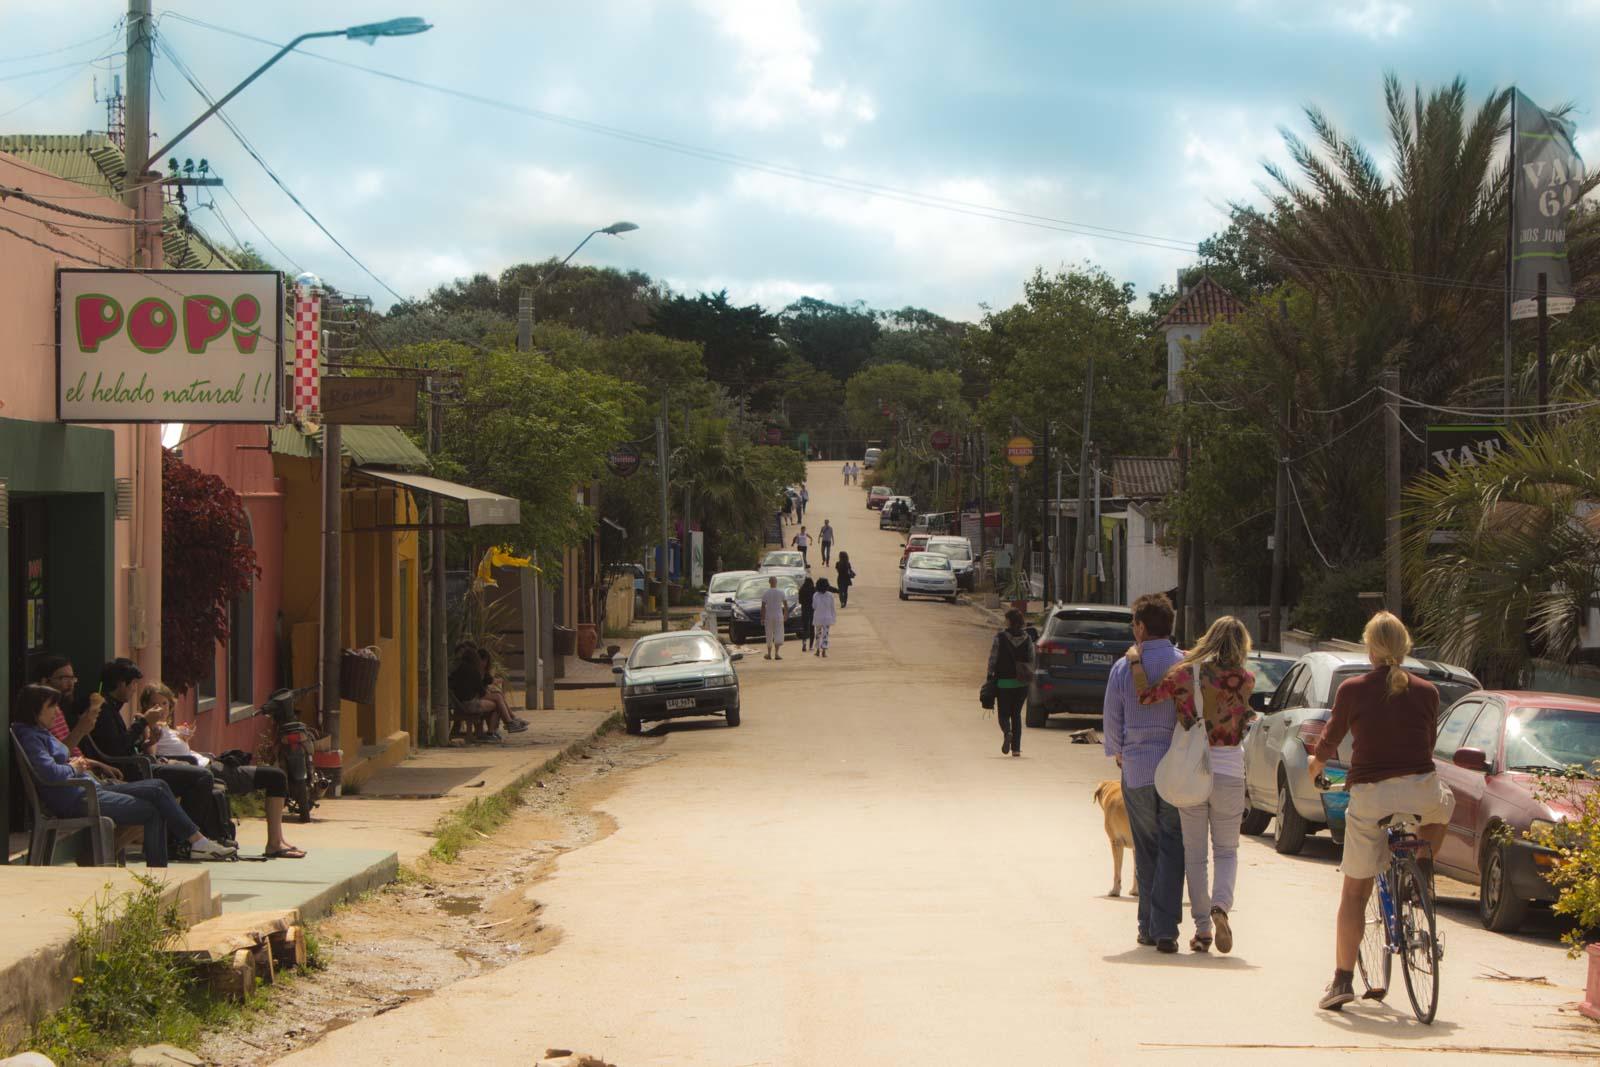 Uruguay beaches from Punta Del Este